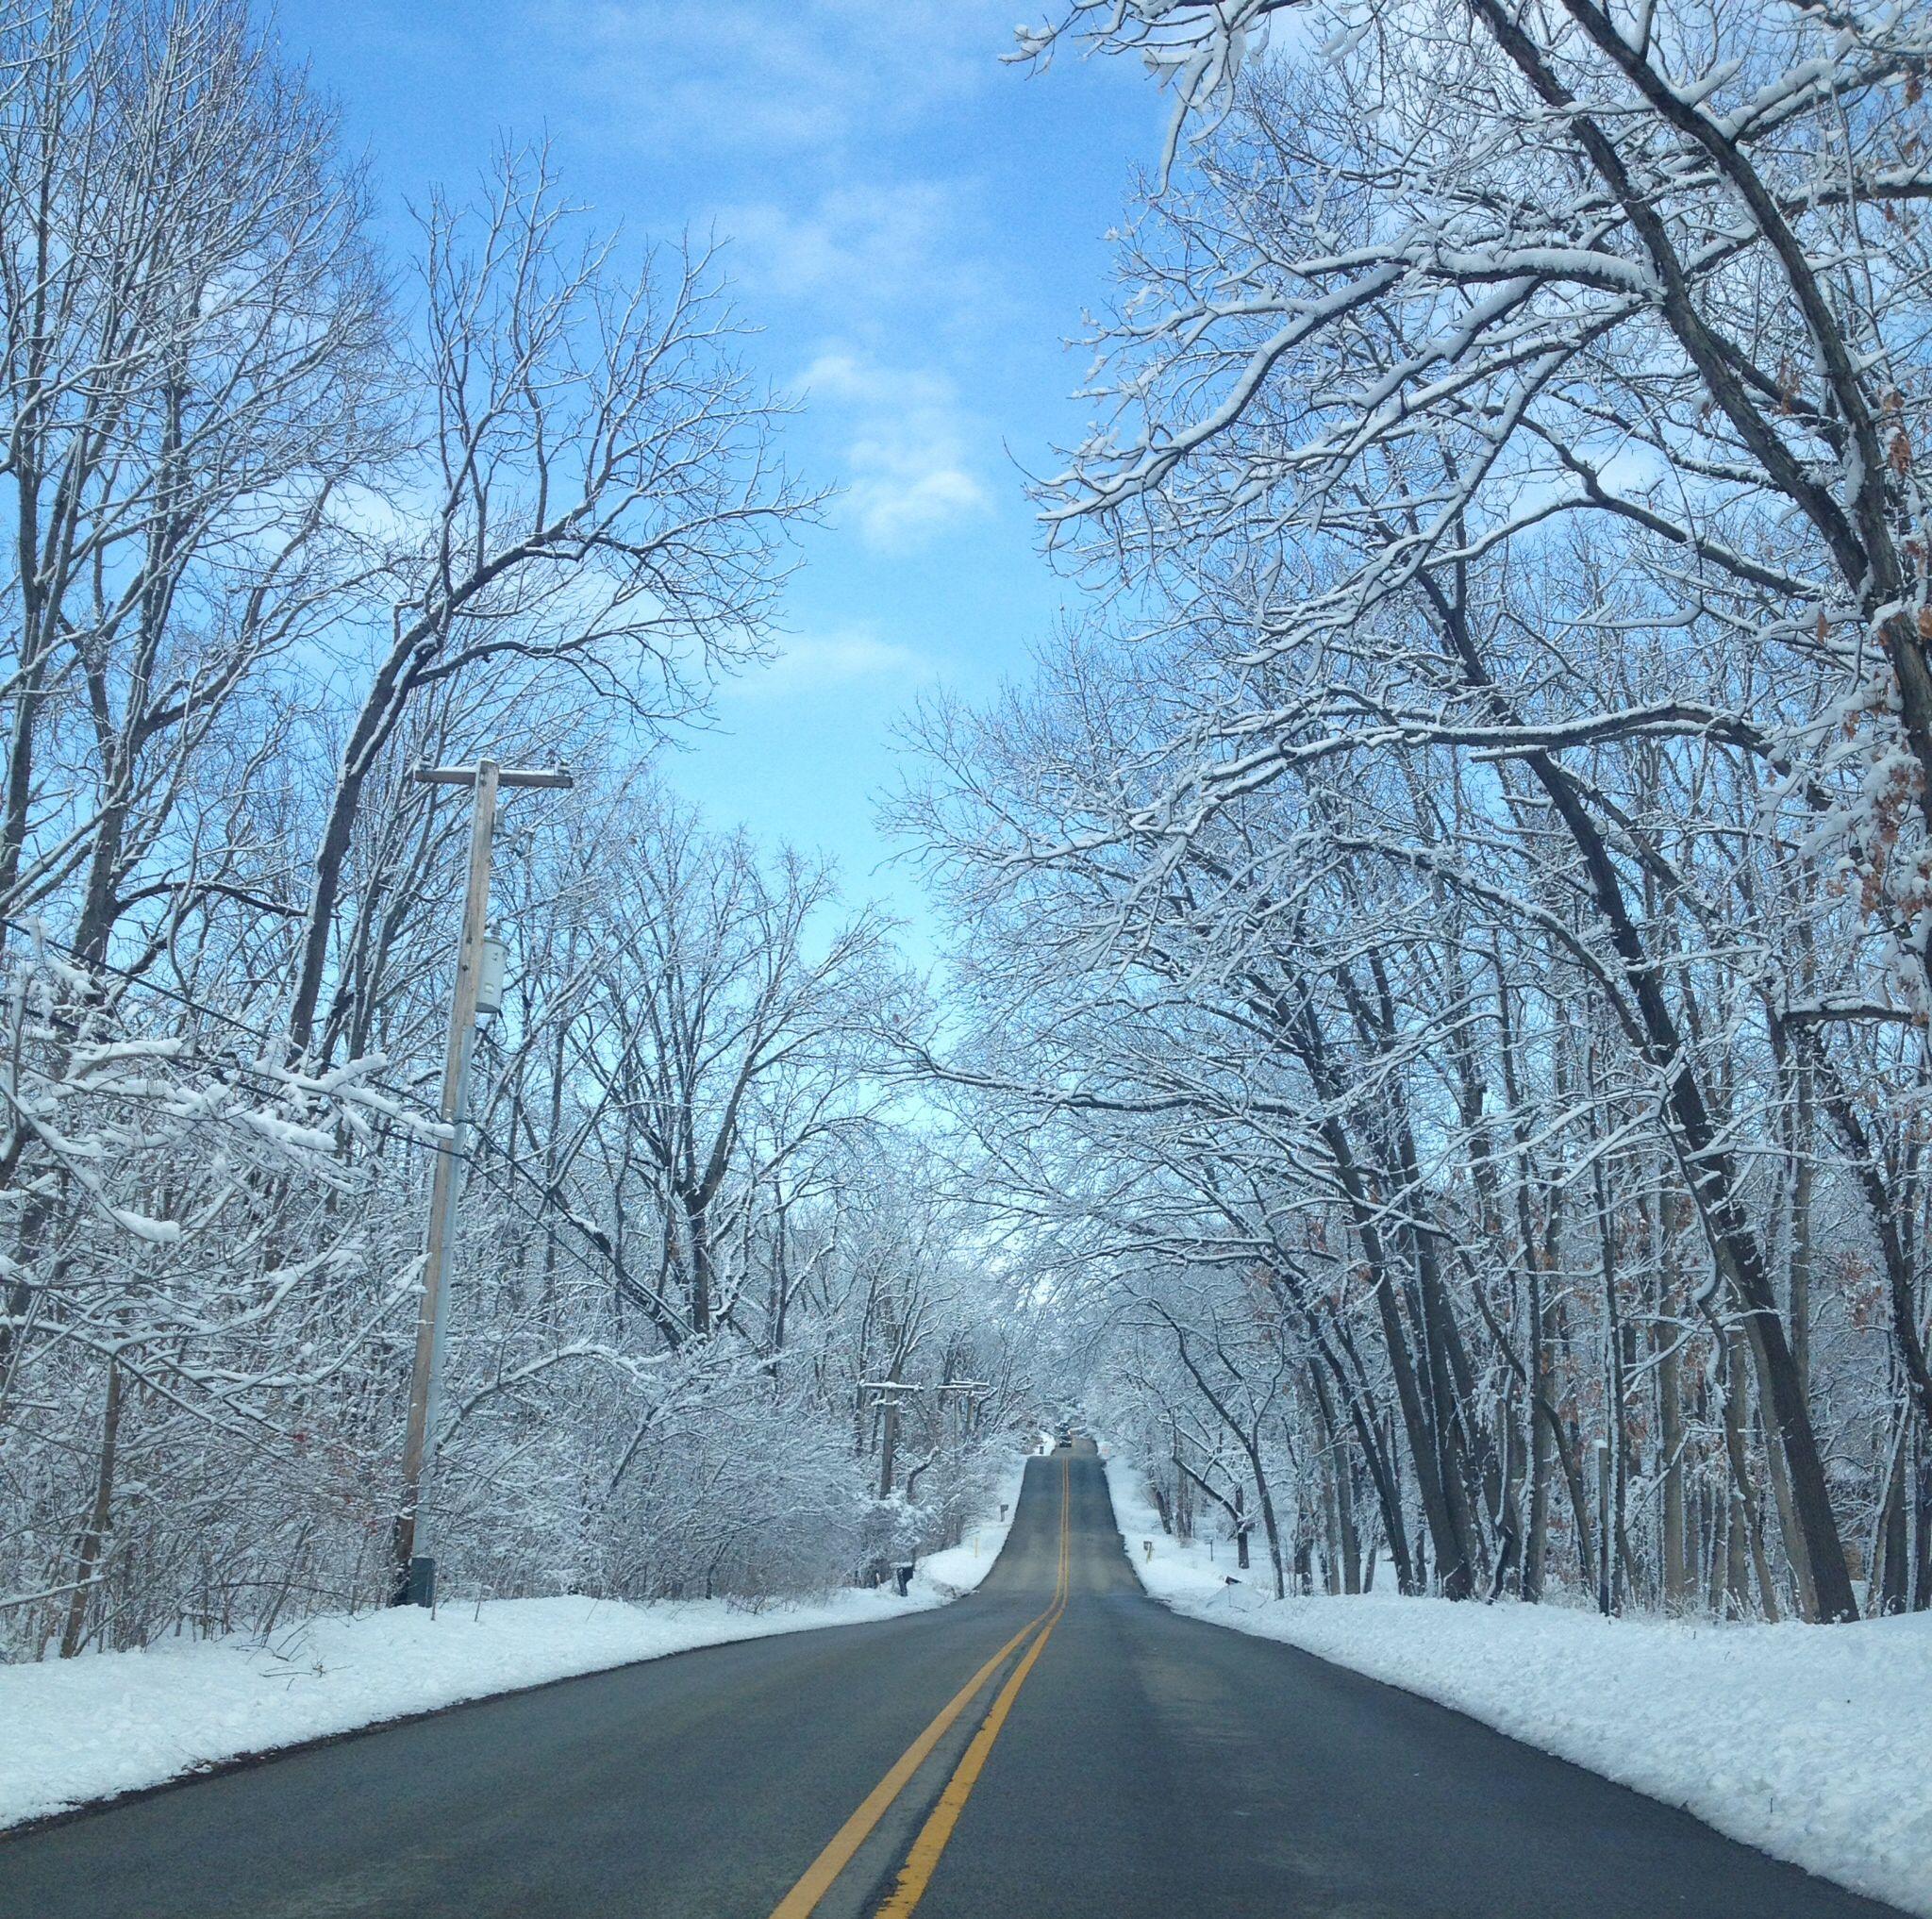 Peaceful snowfall